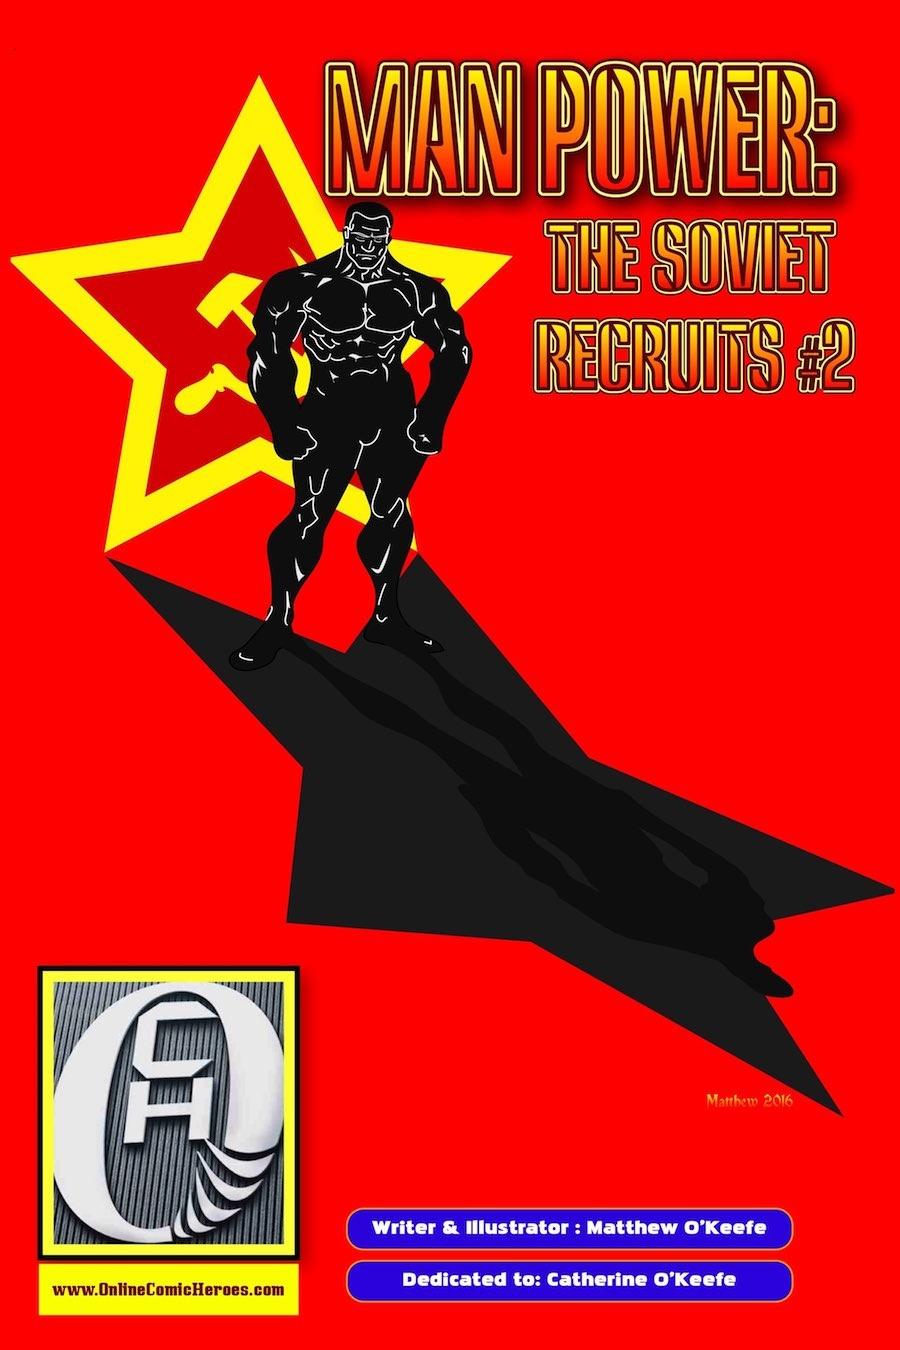 Man Power: The Soviets Recruit #2